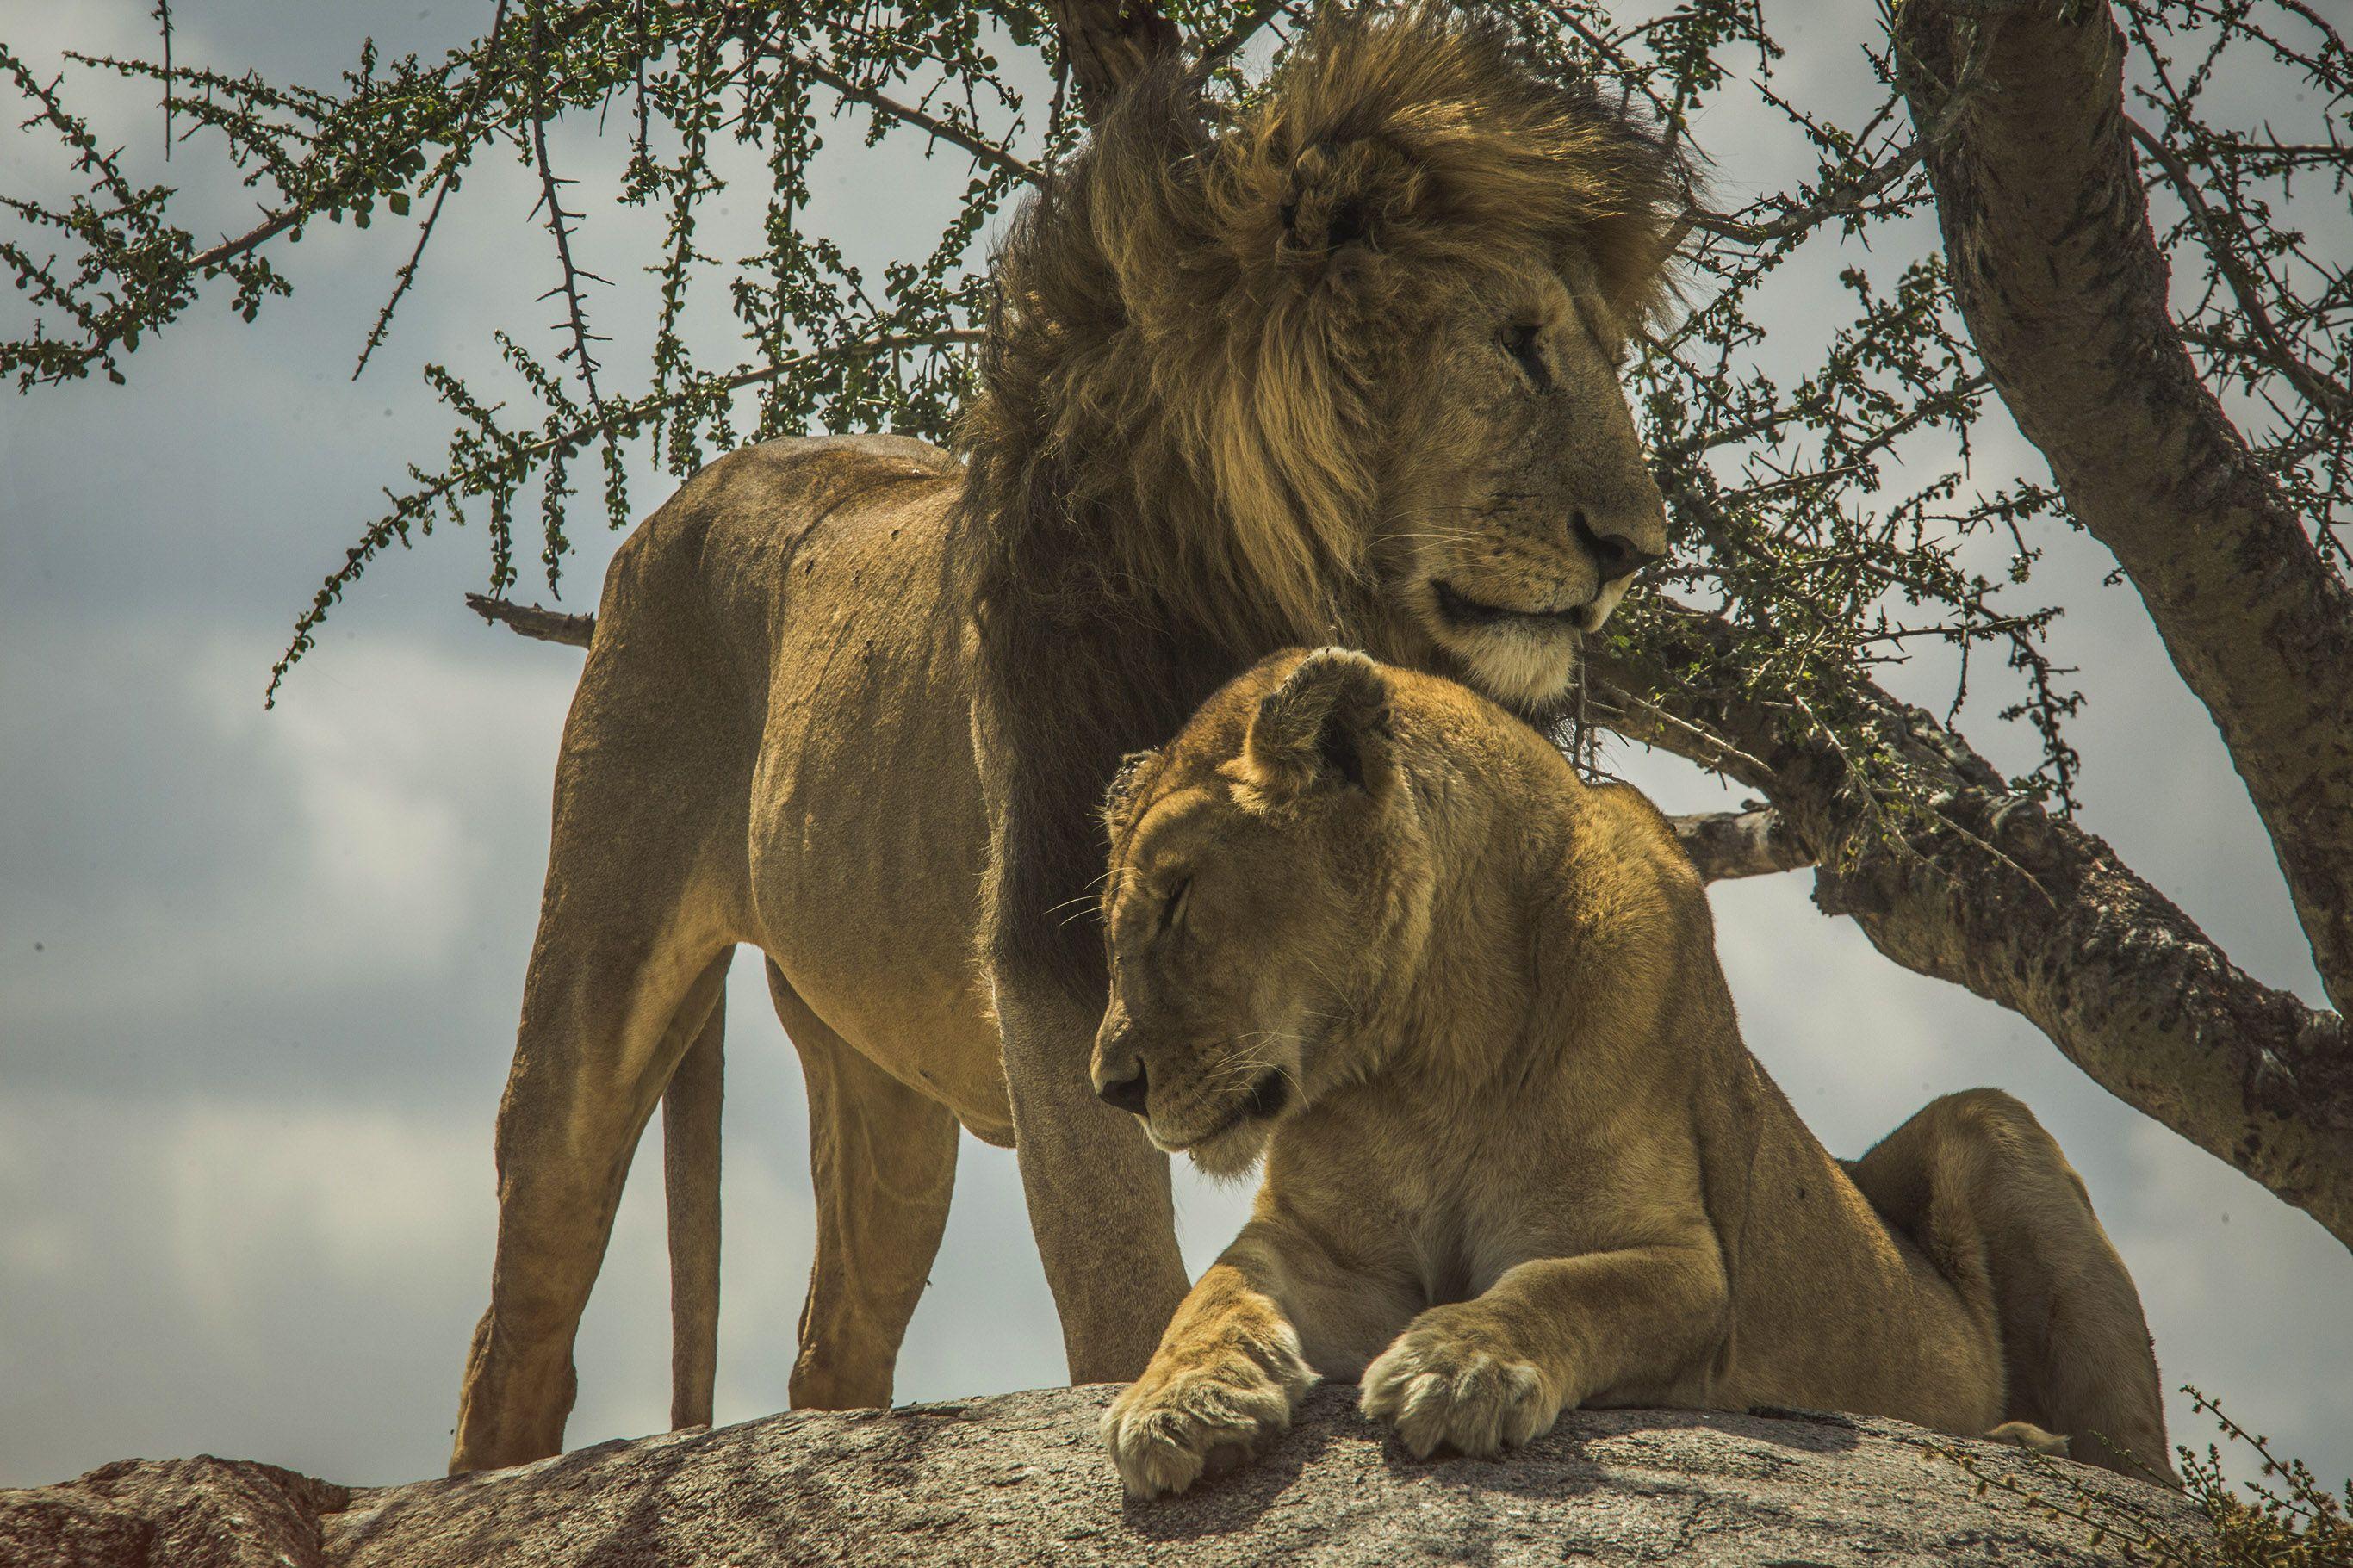 The ABCs of Spotting lions on safari in Tanzania